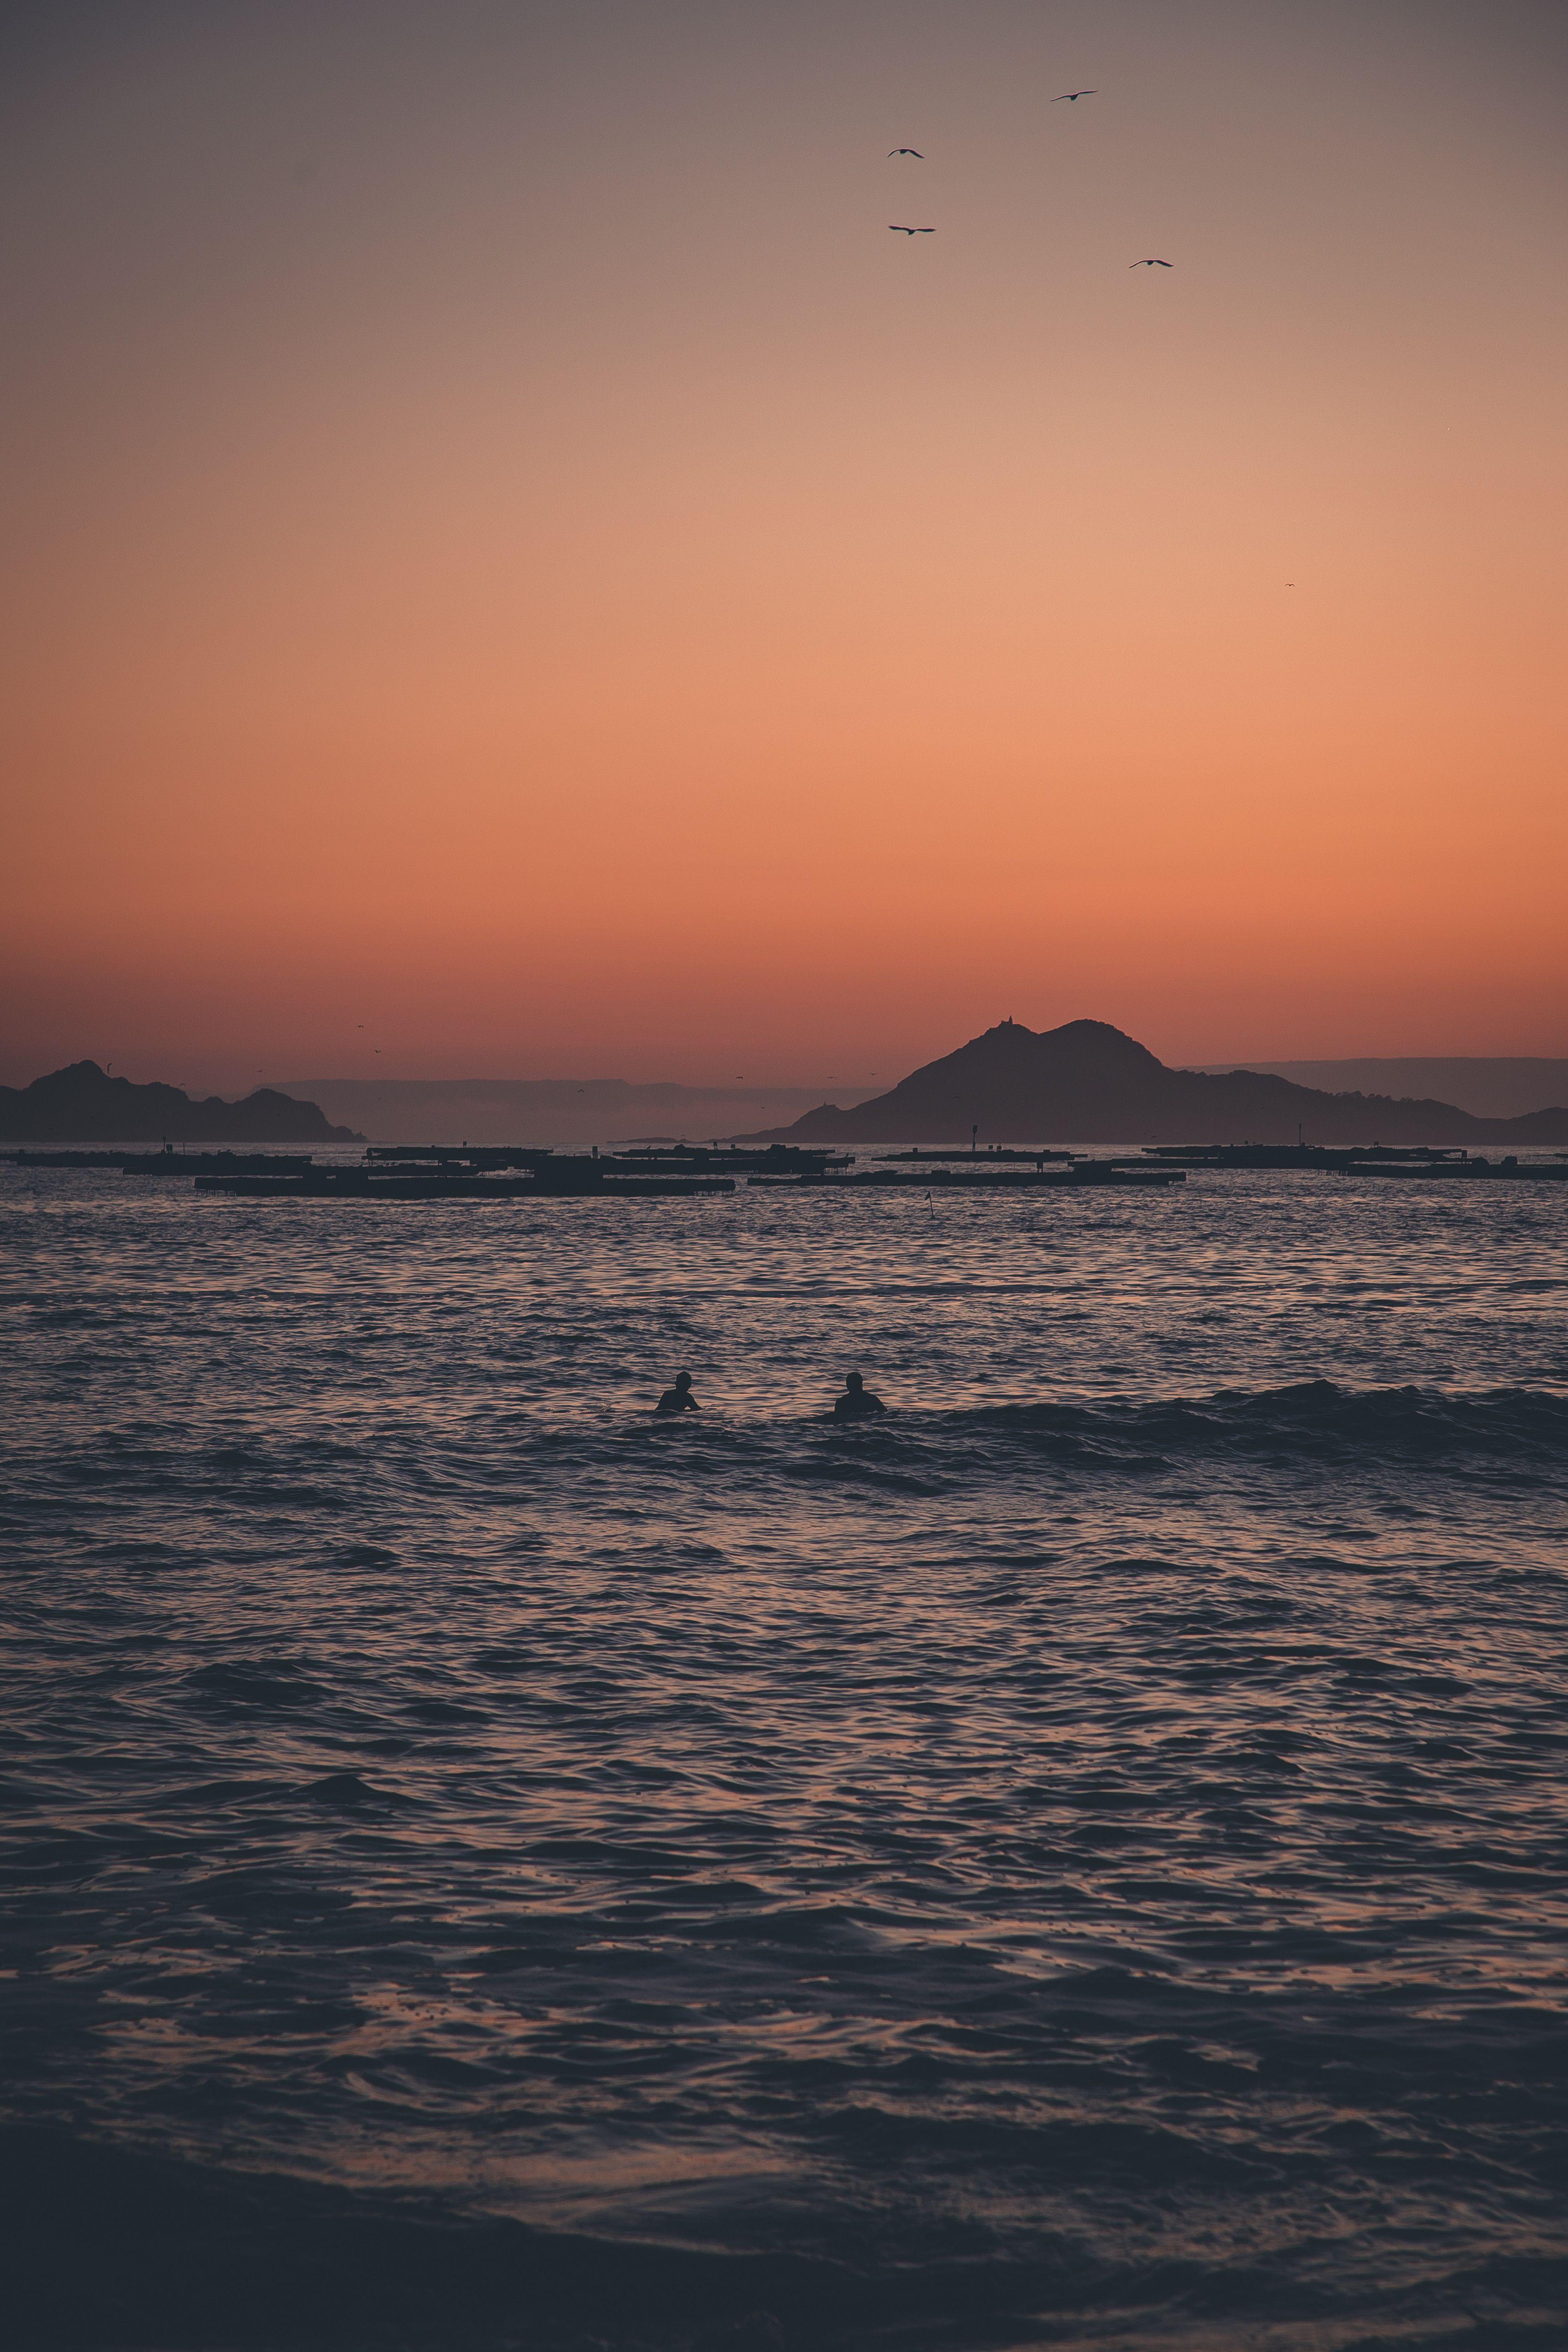 Free Photos Dawn Dusk Nature Ocean Ocean Wallpaper Beautiful Ocean Sunset Wallpaper sea dusk mountains sunset lake